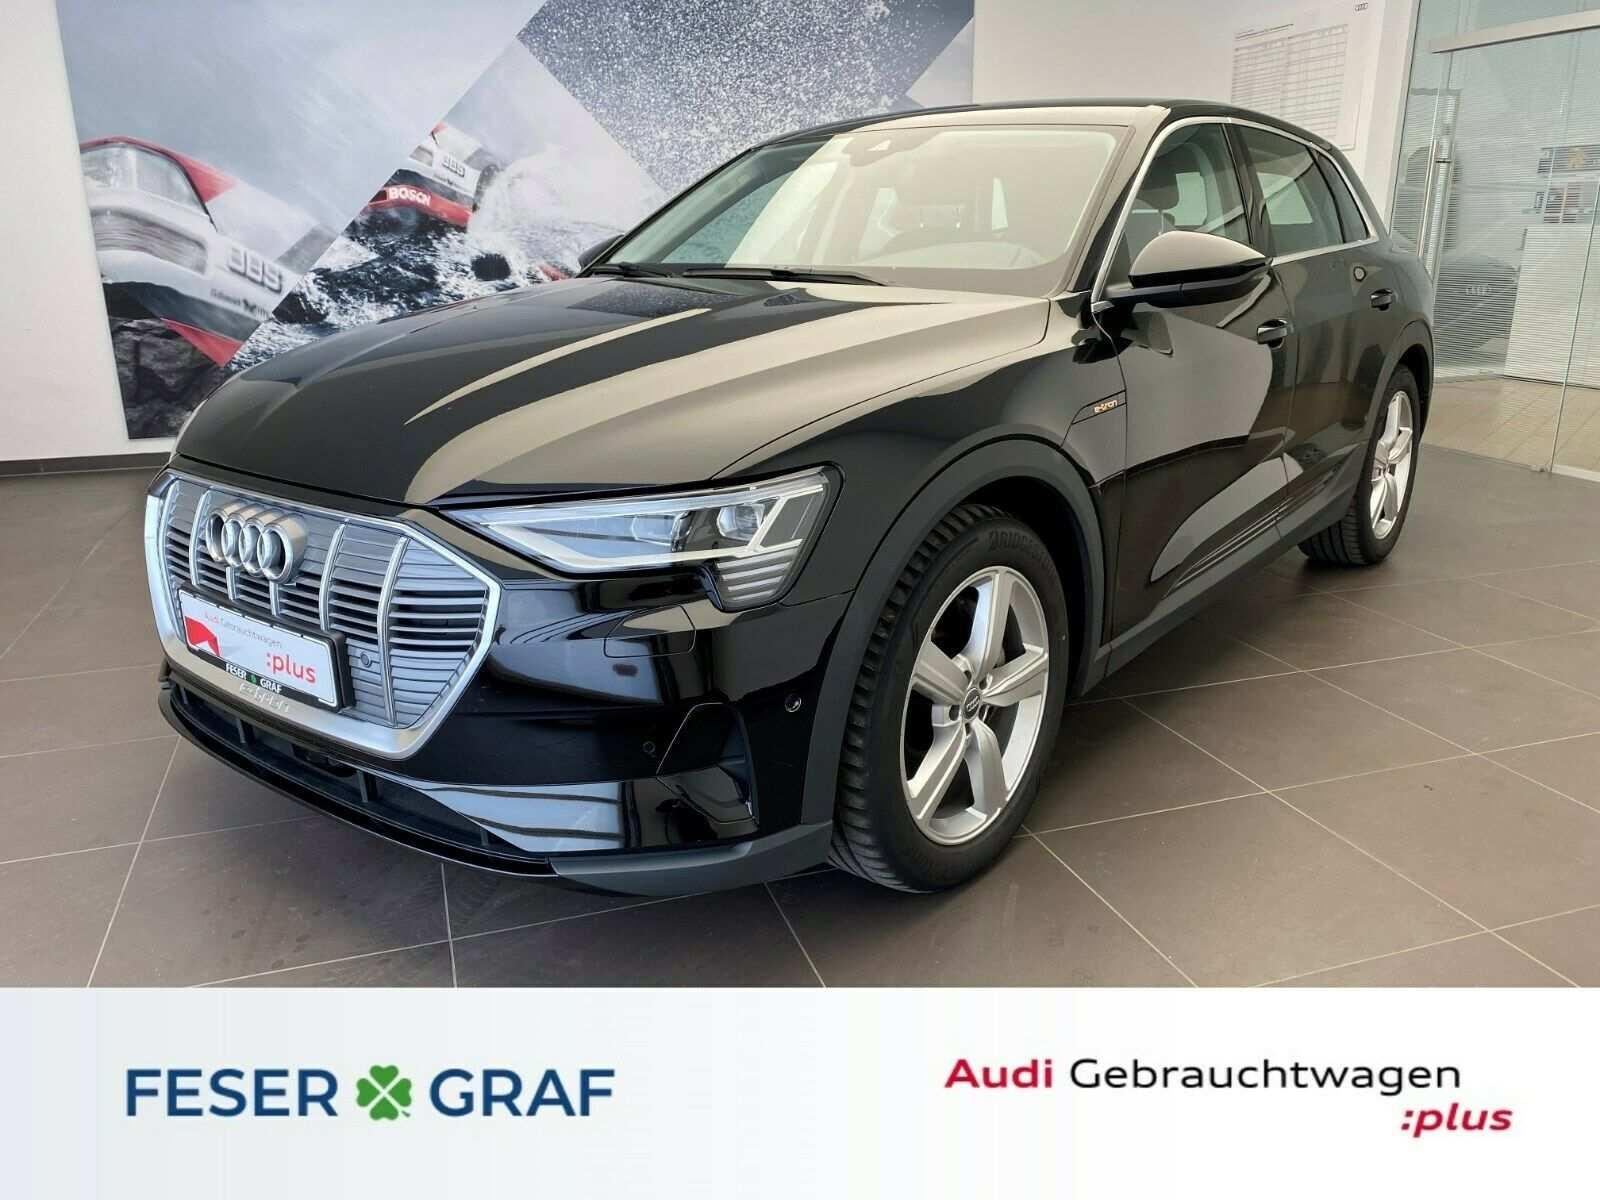 Audi e-tron 55 qu. - Kamera - Luft - ACC - B&O - AHK, Jahr 2019, Elektro